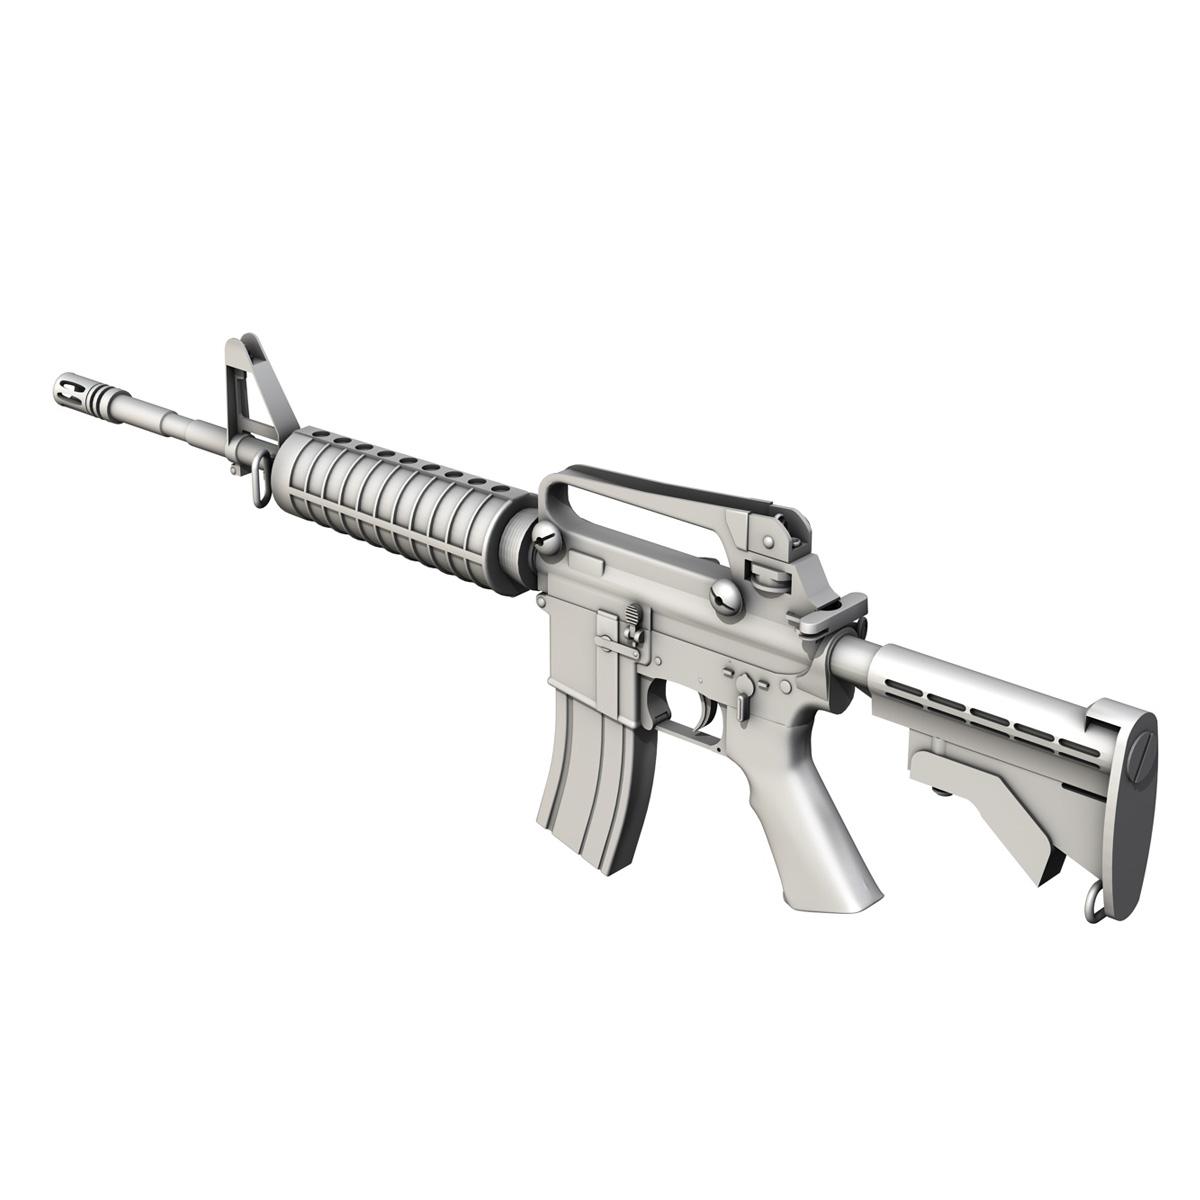 colt m4a1 carbine довтолгооны буу 3d загвар 3ds fbx c4d lwo obj 187793